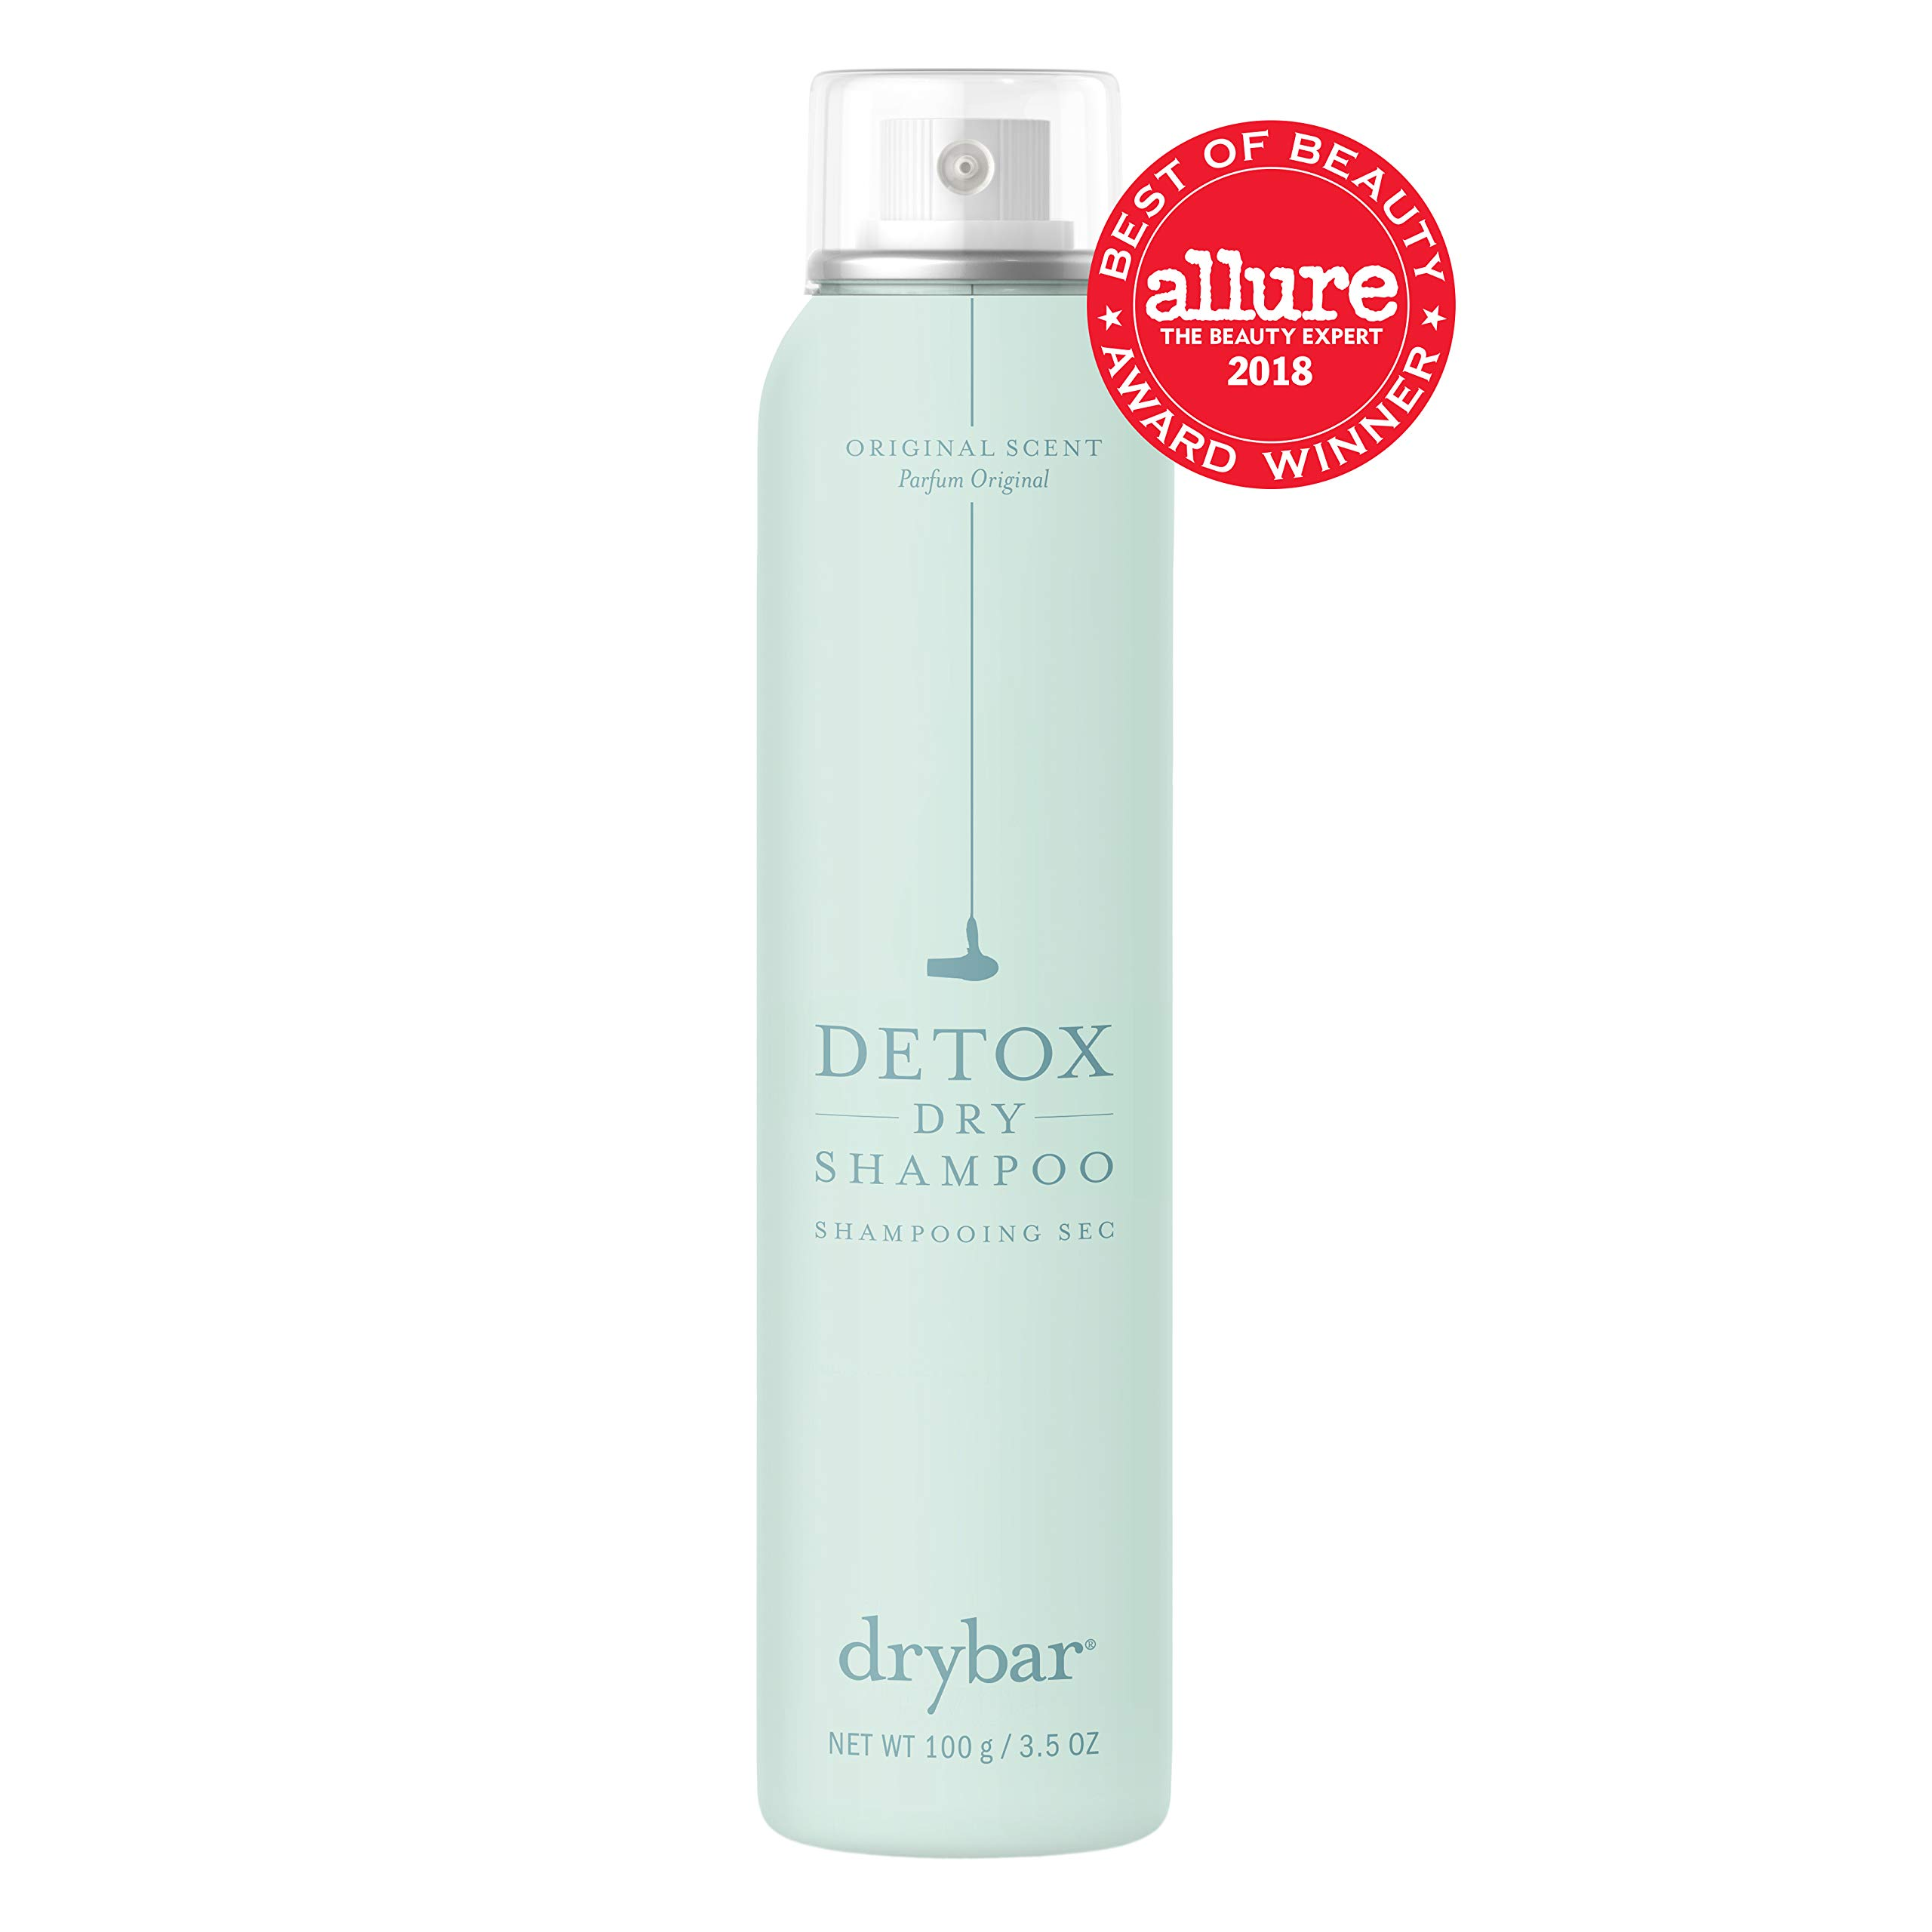 Drybar Detox Dry Shampoo (Original Scent) 3.5 Ounces by Drybar